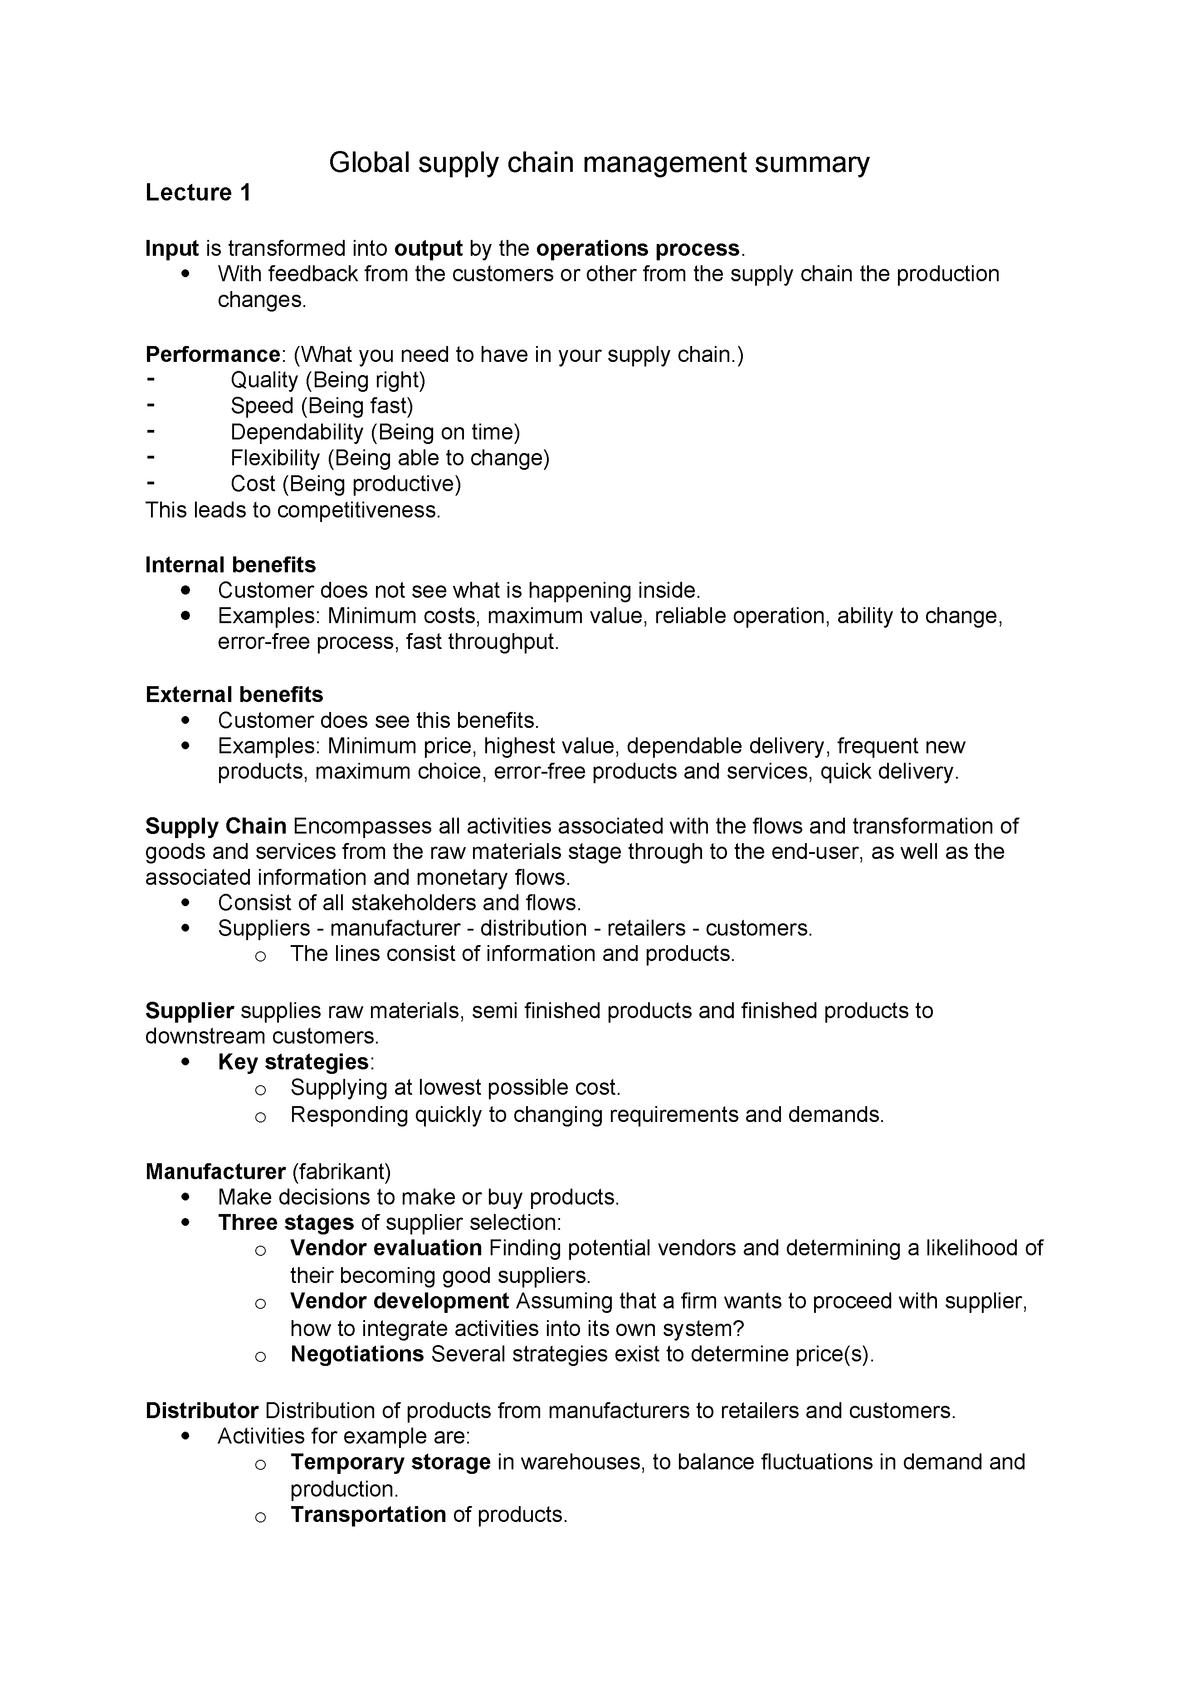 Summary EBP018A05 EBP018A05 09 Feb 2019 - StuDocu